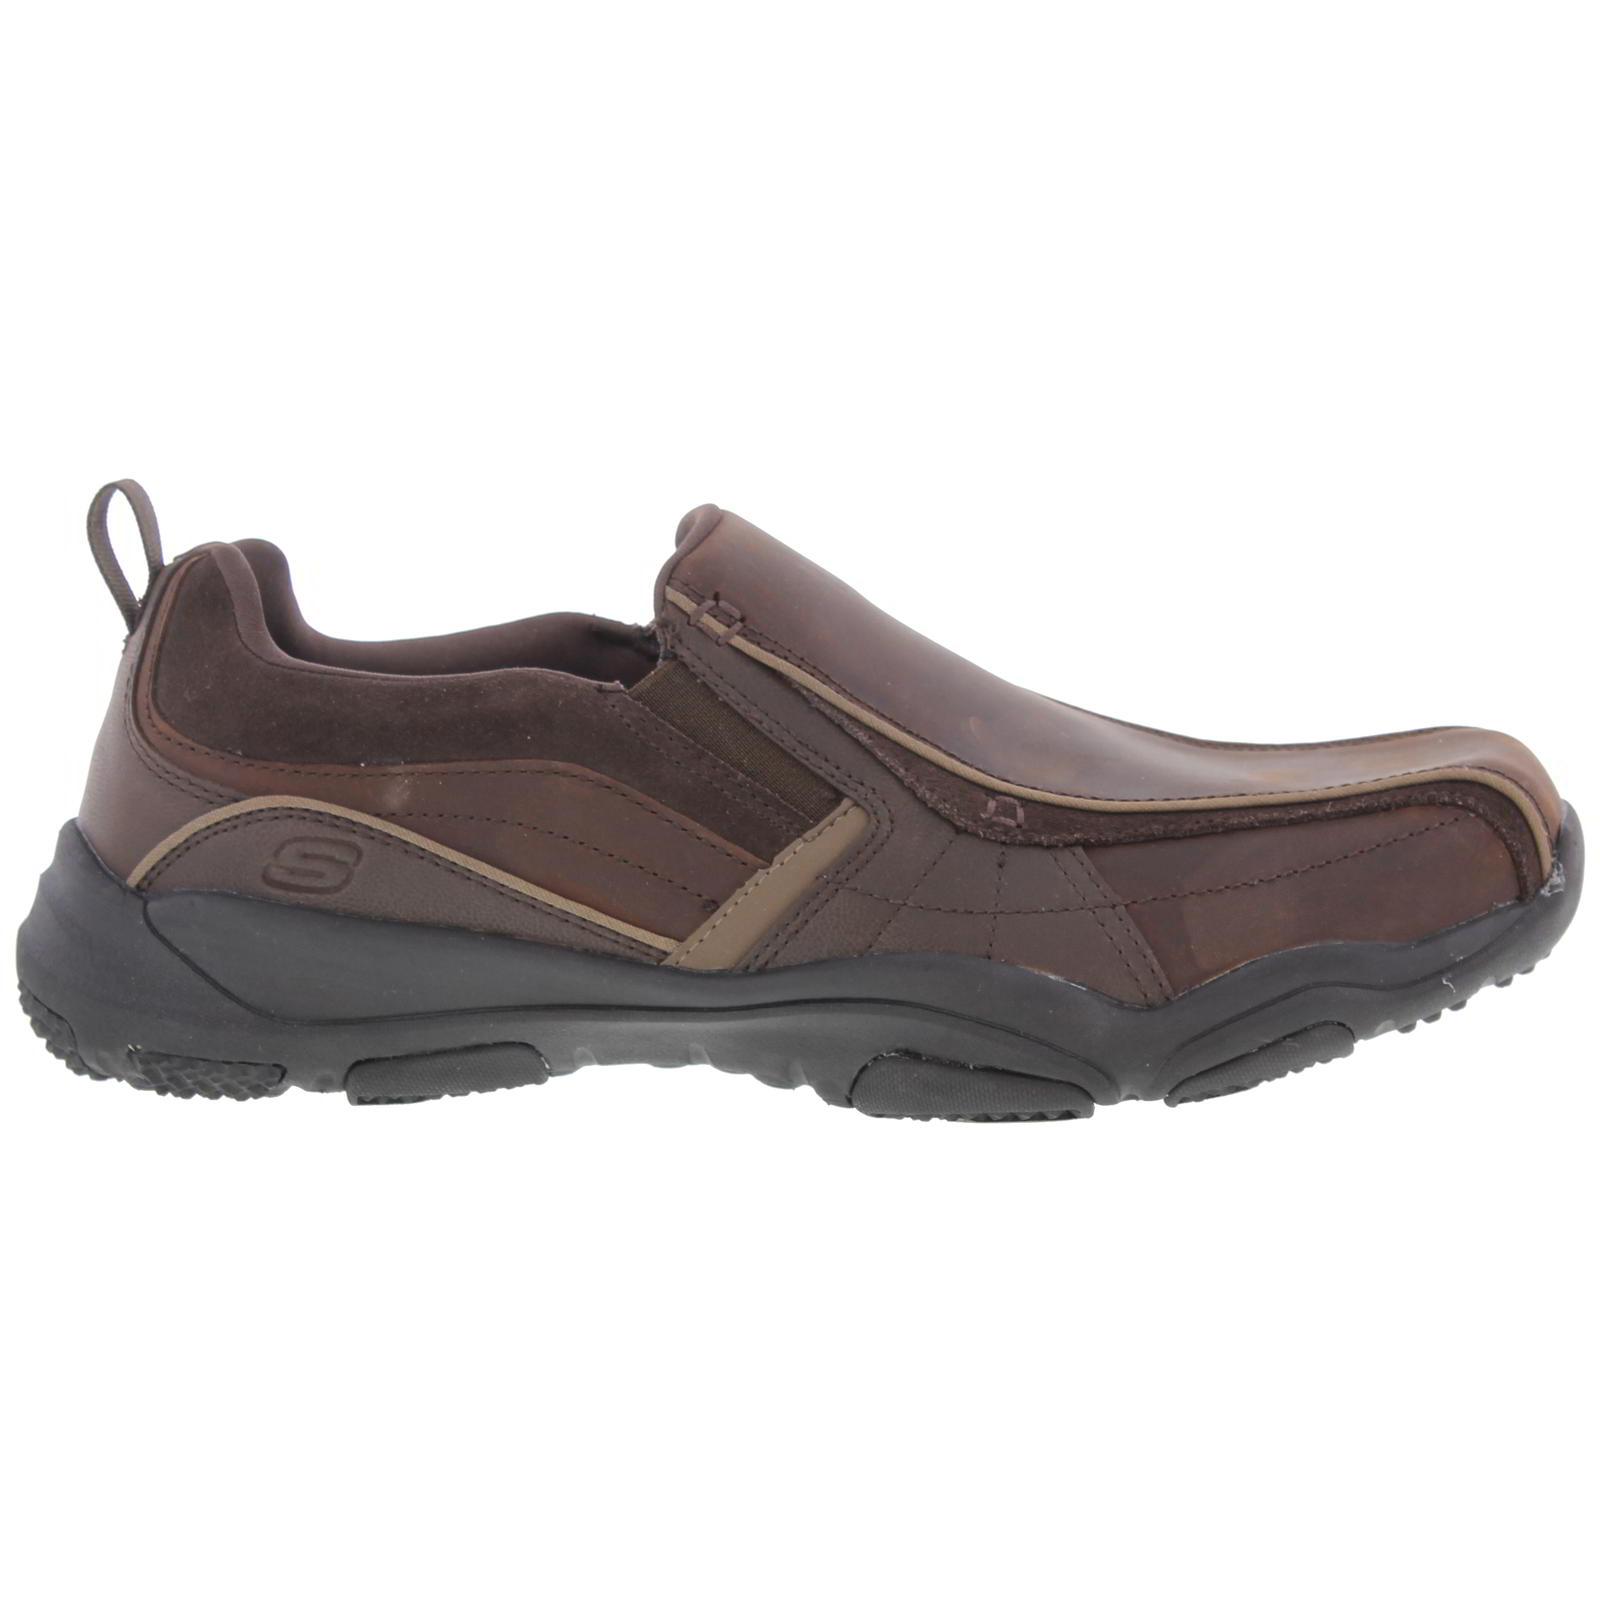 Skechers Work Slip Resistance Womens Black Leather Memory Foam Sz 8.5 M To Ensure Smooth Transmission Women's Shoes